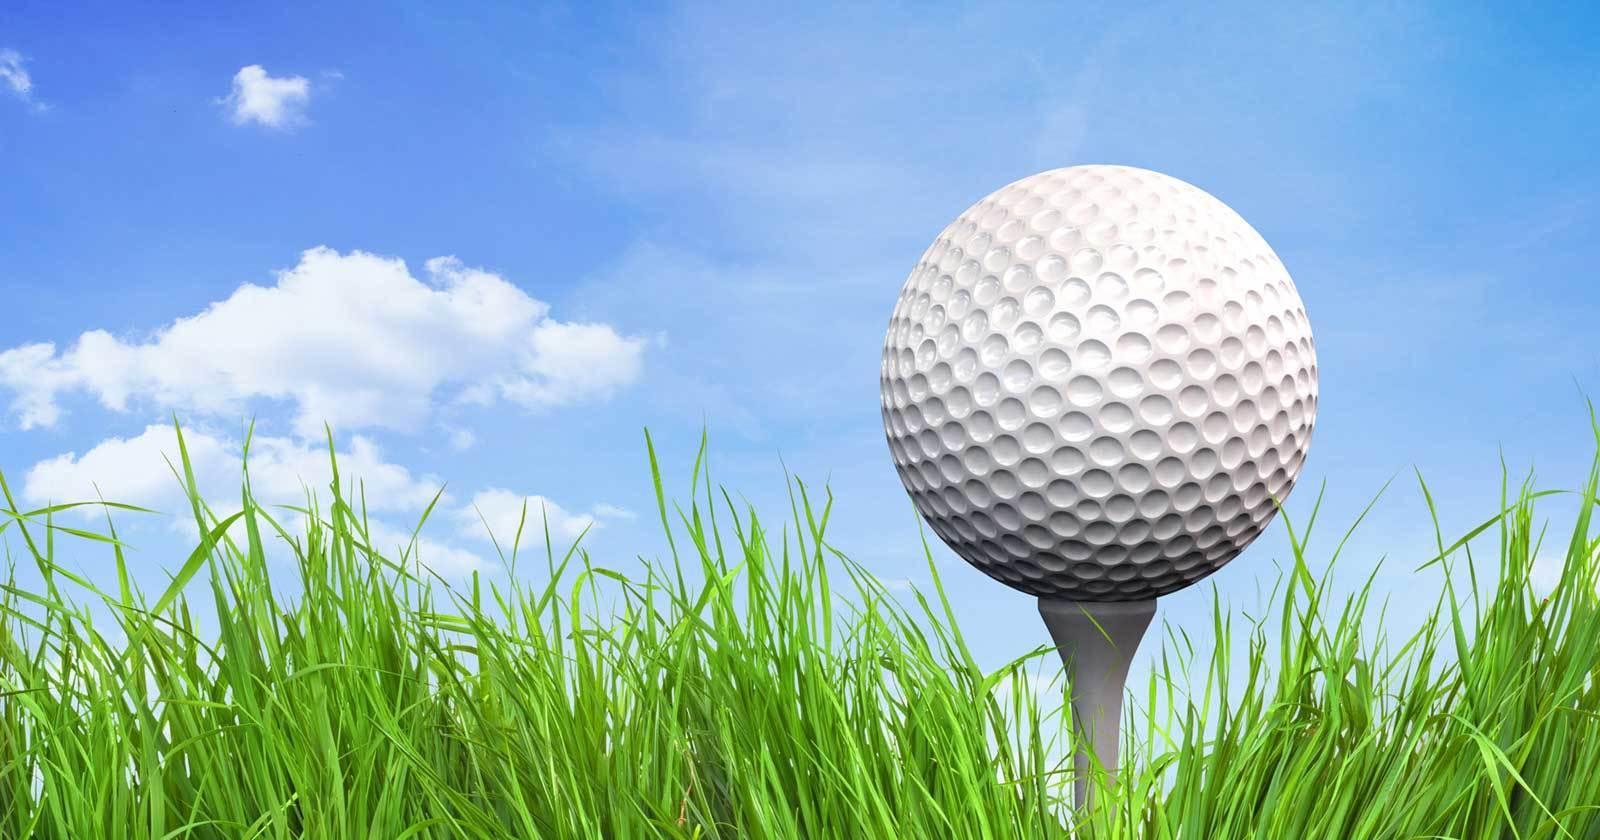 Danske og Sydsvenske golfbaner samlet et sted